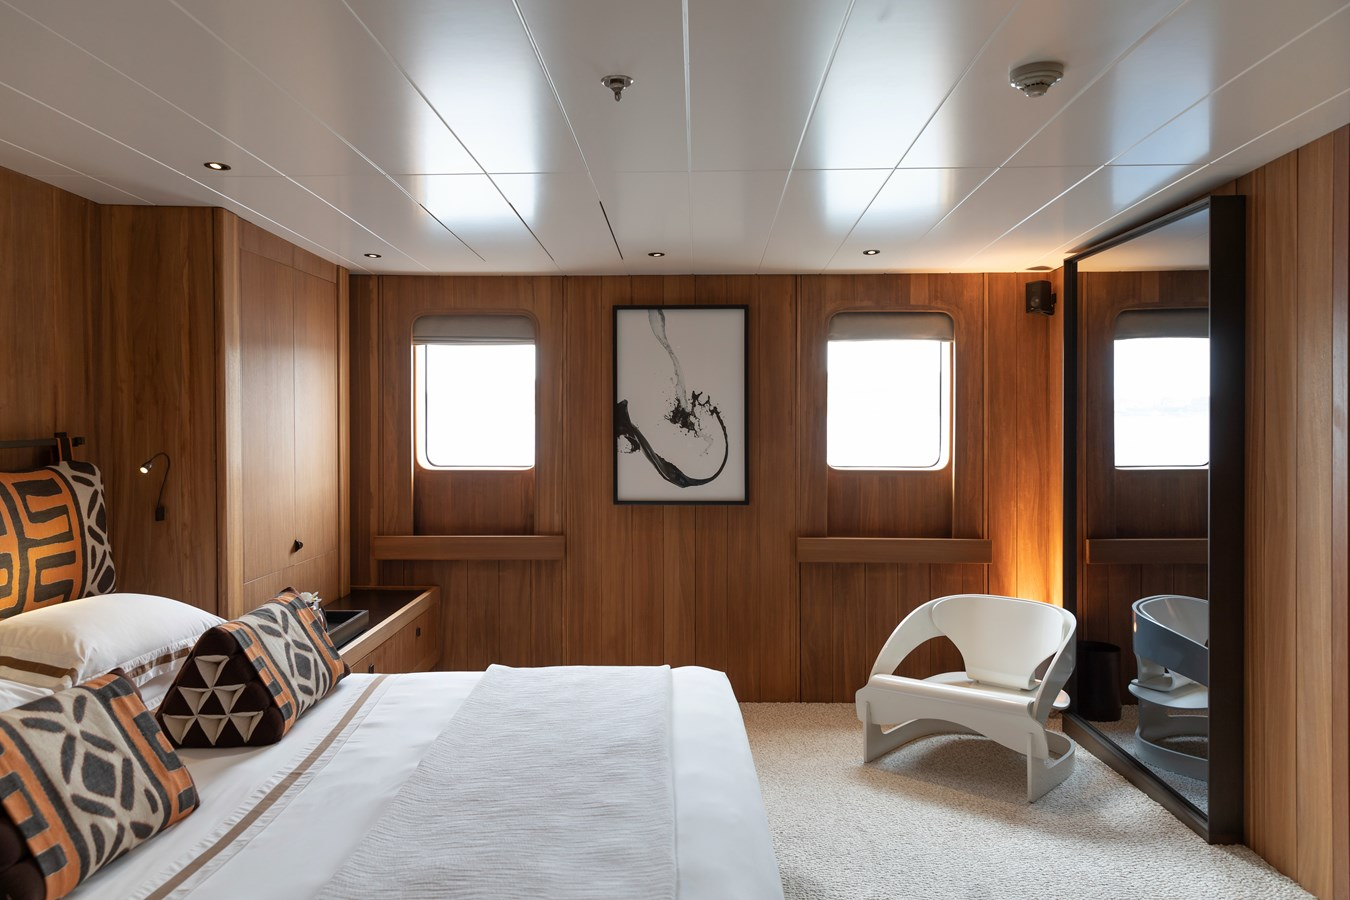 OLIVIA_00004897_vb1514723 1972 OY LAIVATEOLLISUUS  Mega Yacht 2726265